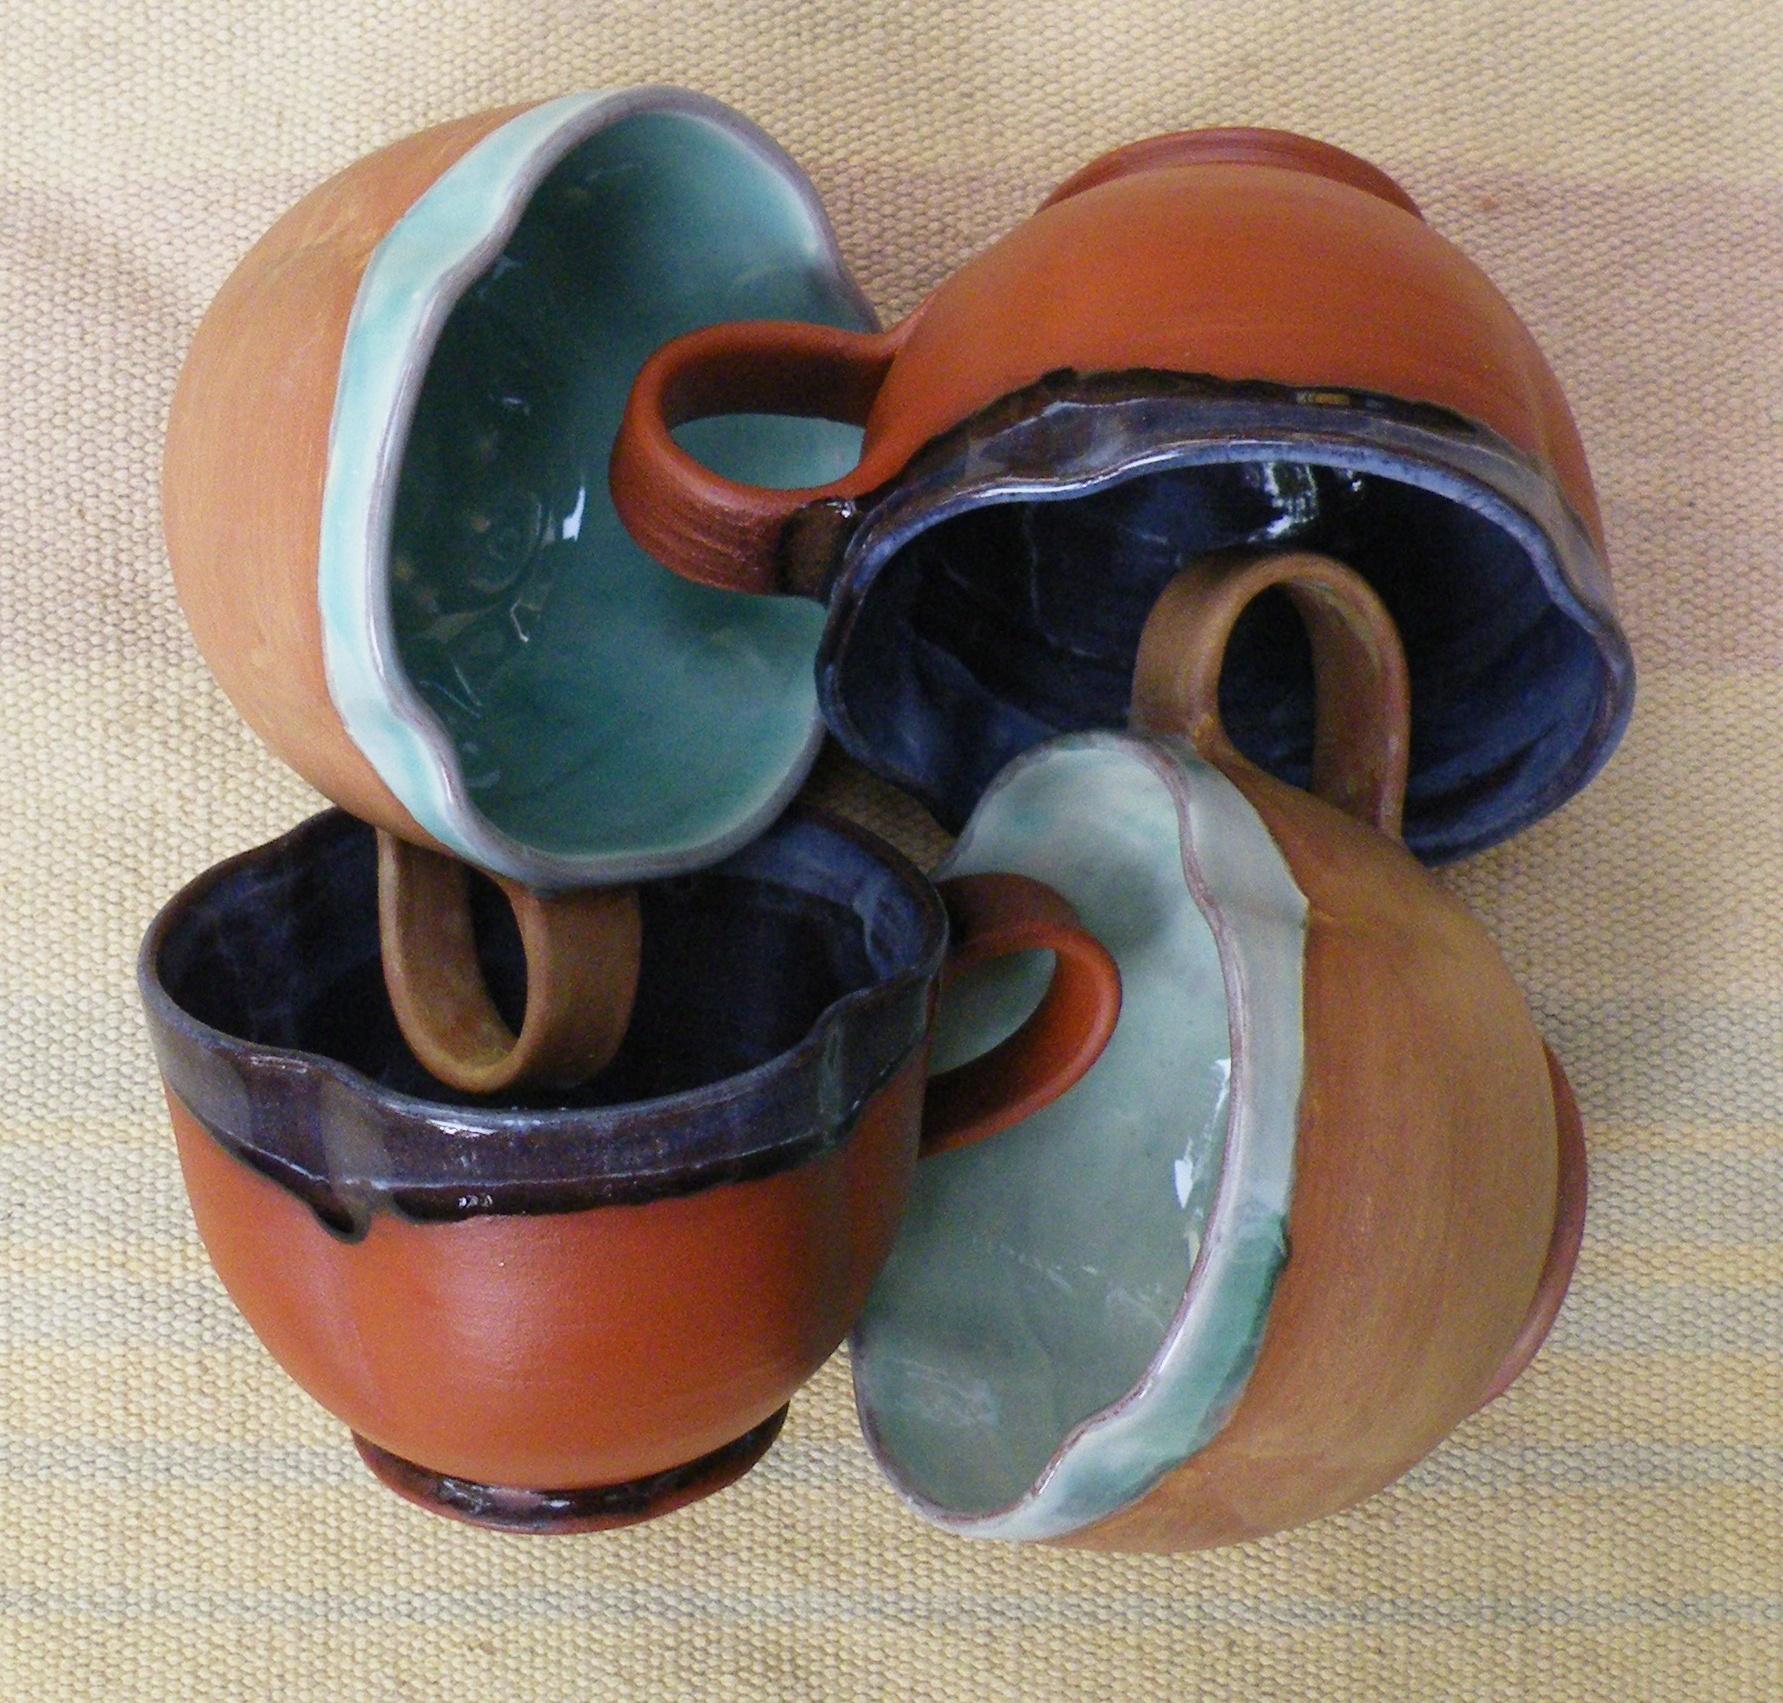 A decent sized Tea Cup handmade from terracotta